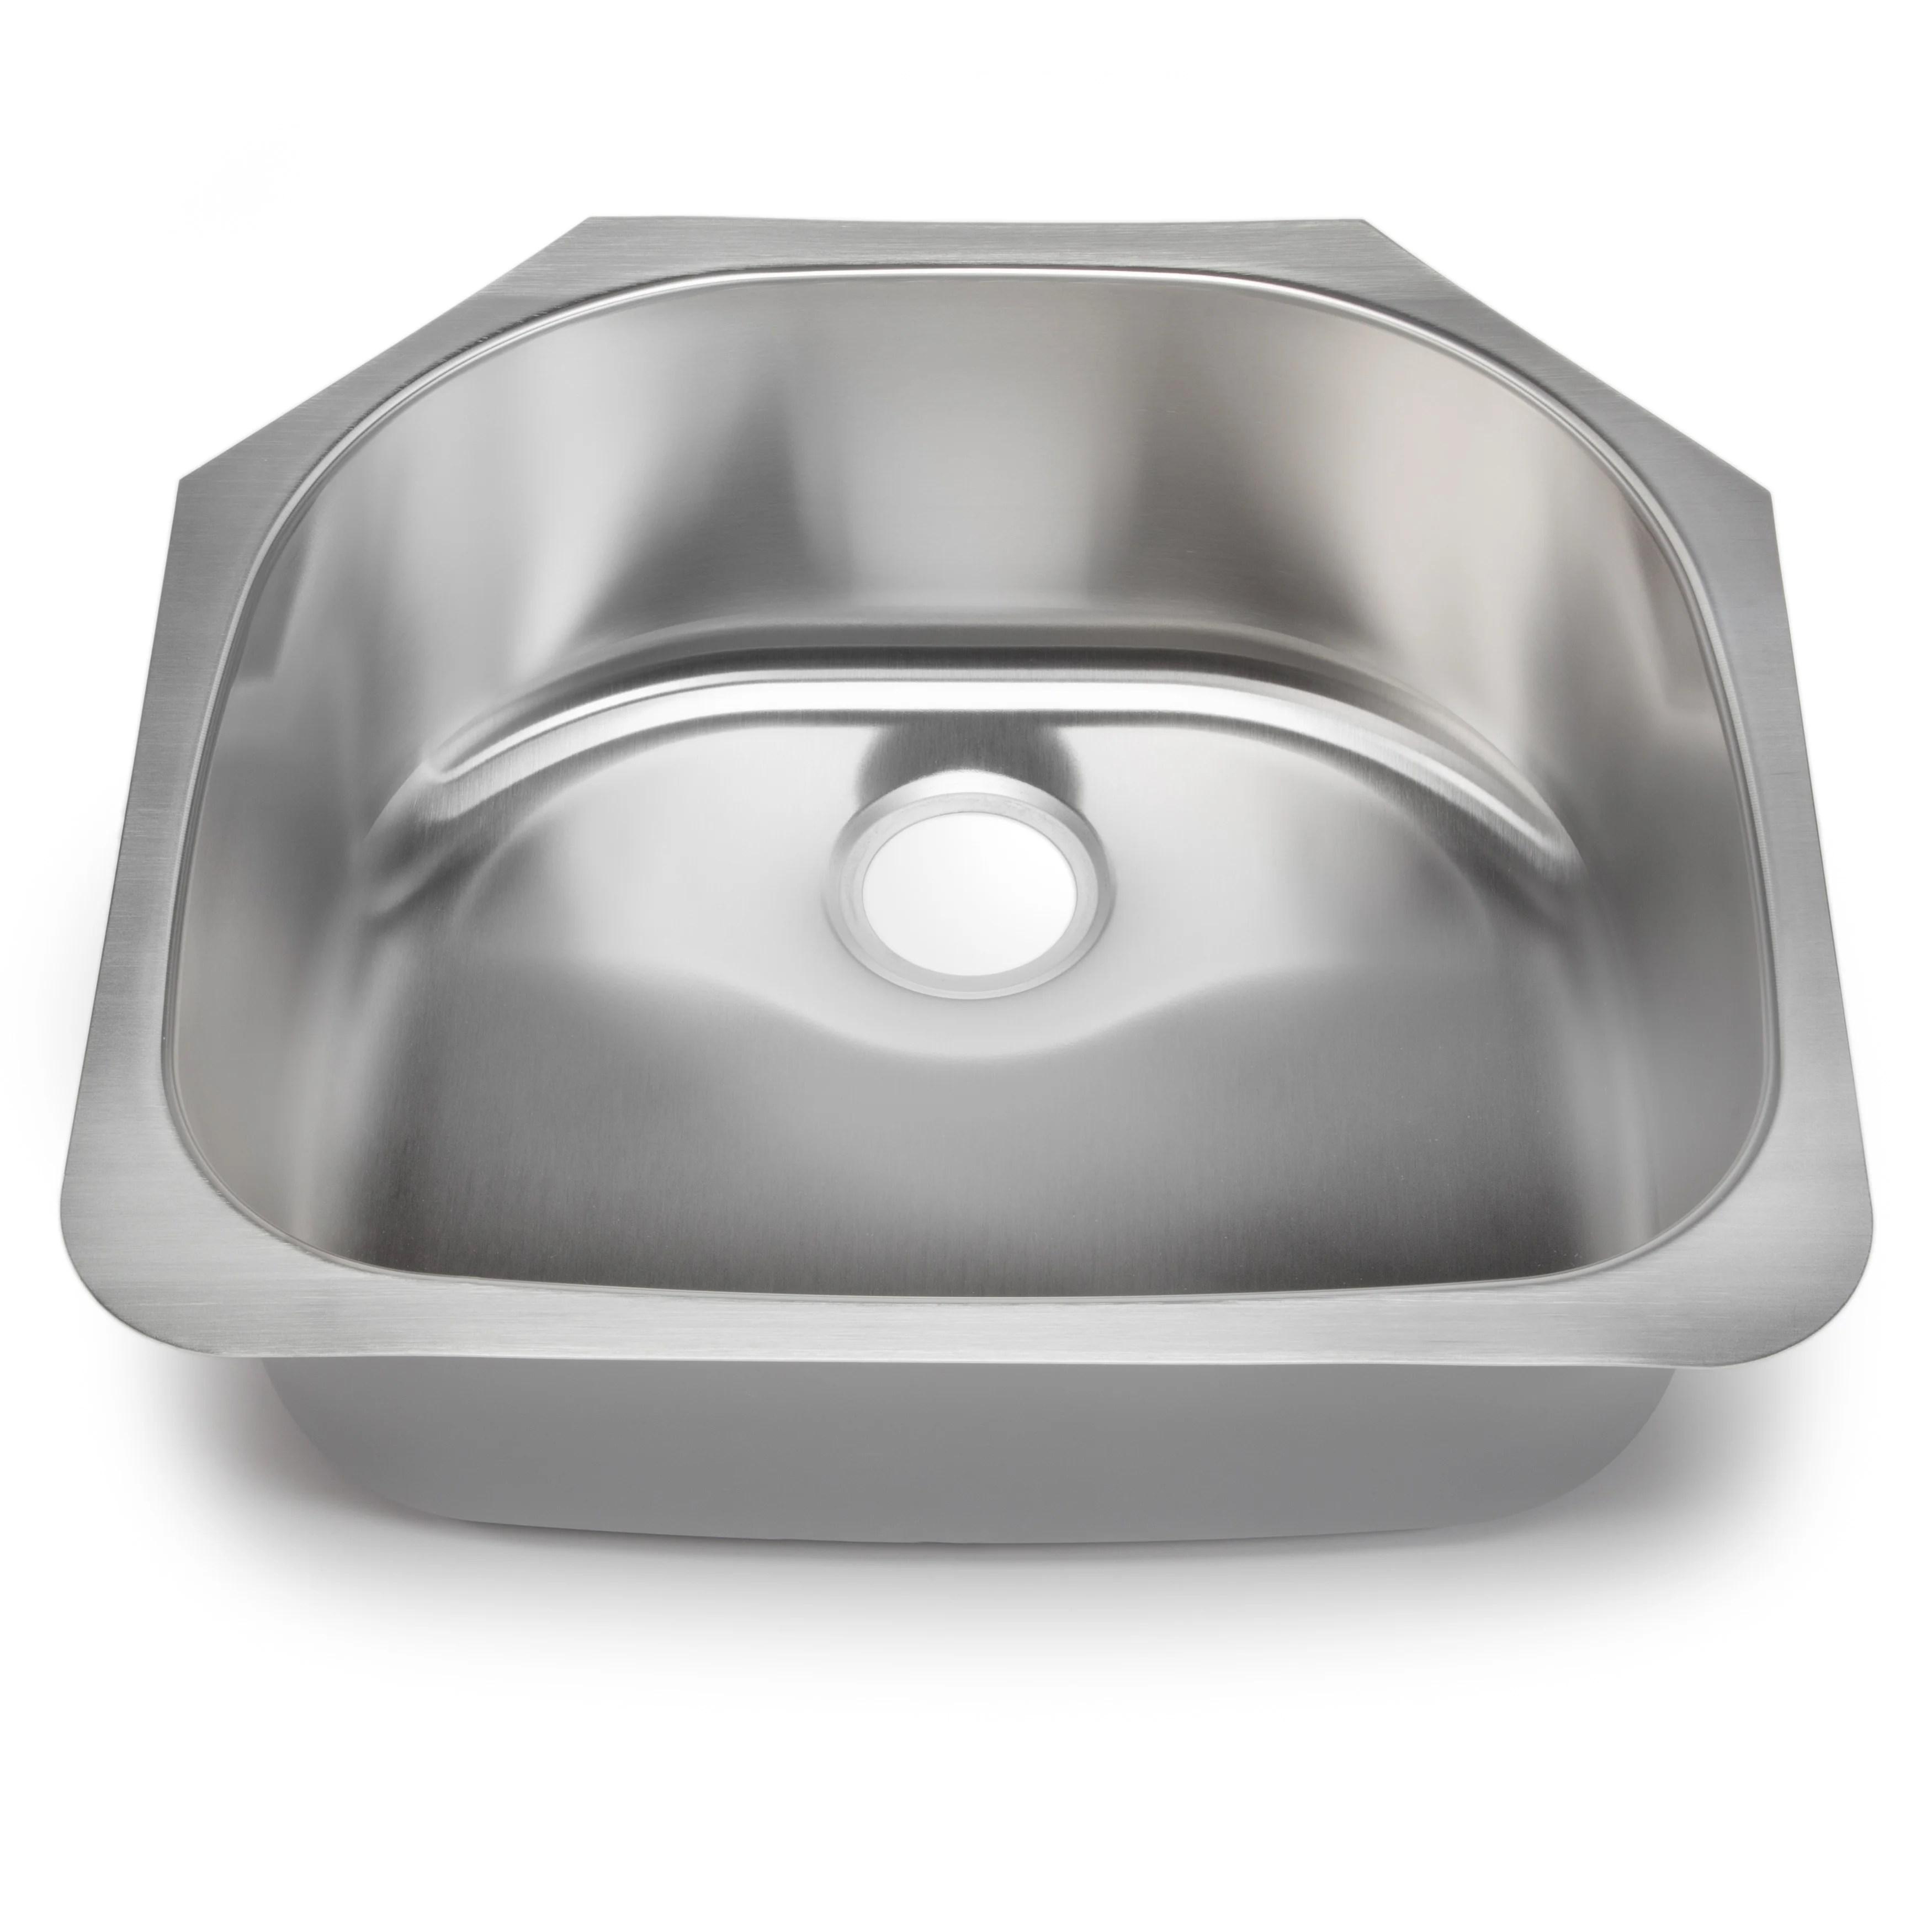 Hahn Classic Chef Series 23.38 x 21 70 30 Single Bowl Kitchen Sink SS038